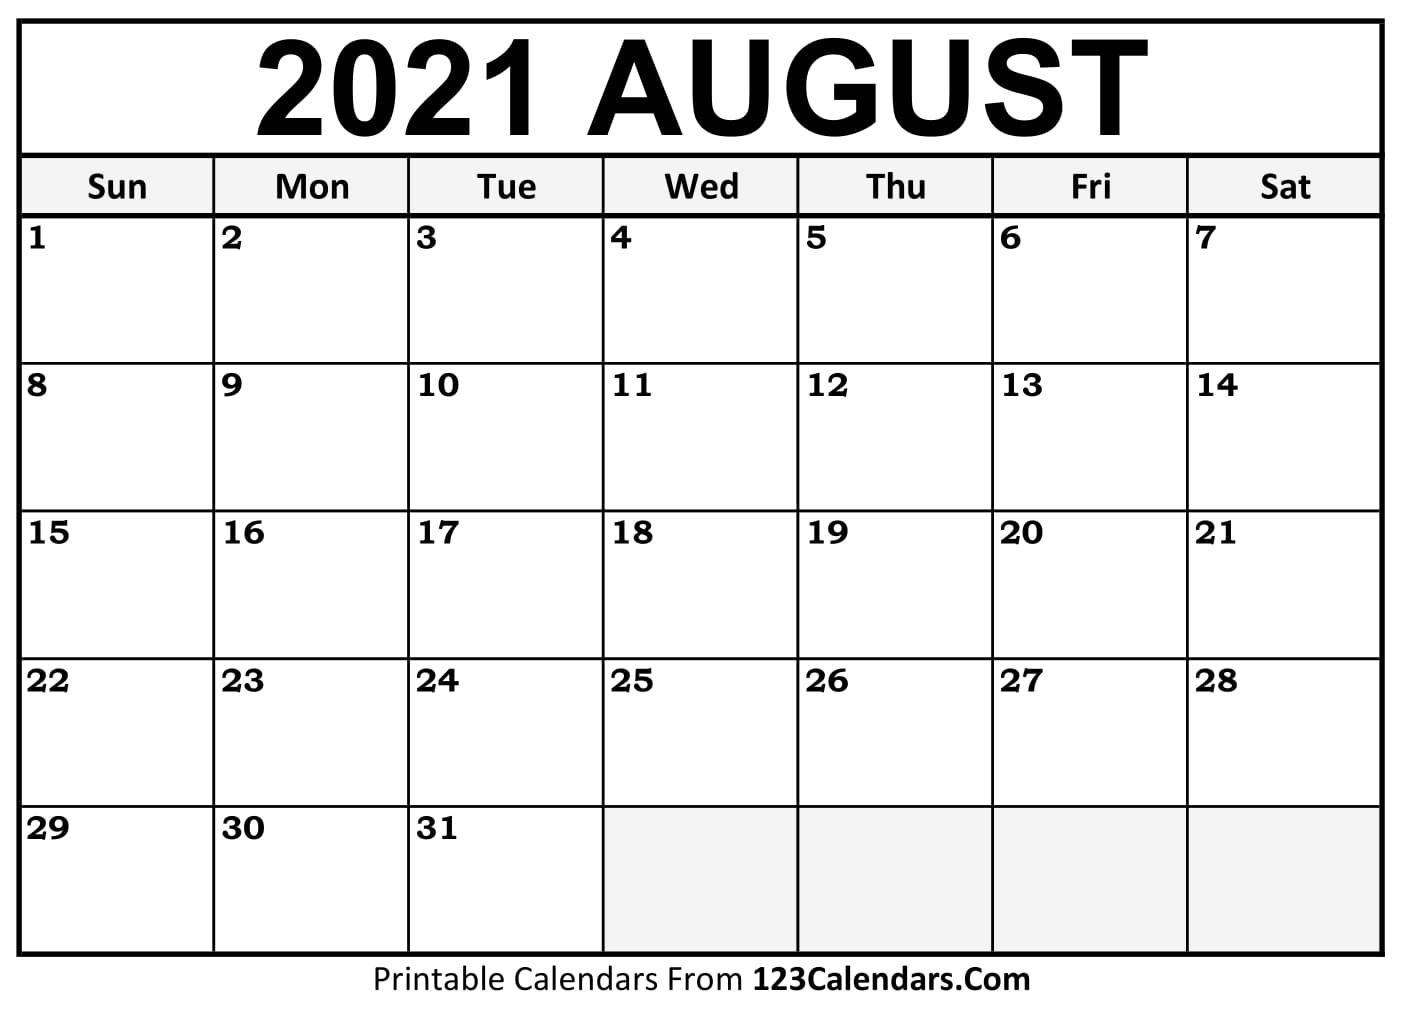 Printable August 2021 Calendar Templates | 123Calendars August 2021 Blank Calendar Printable